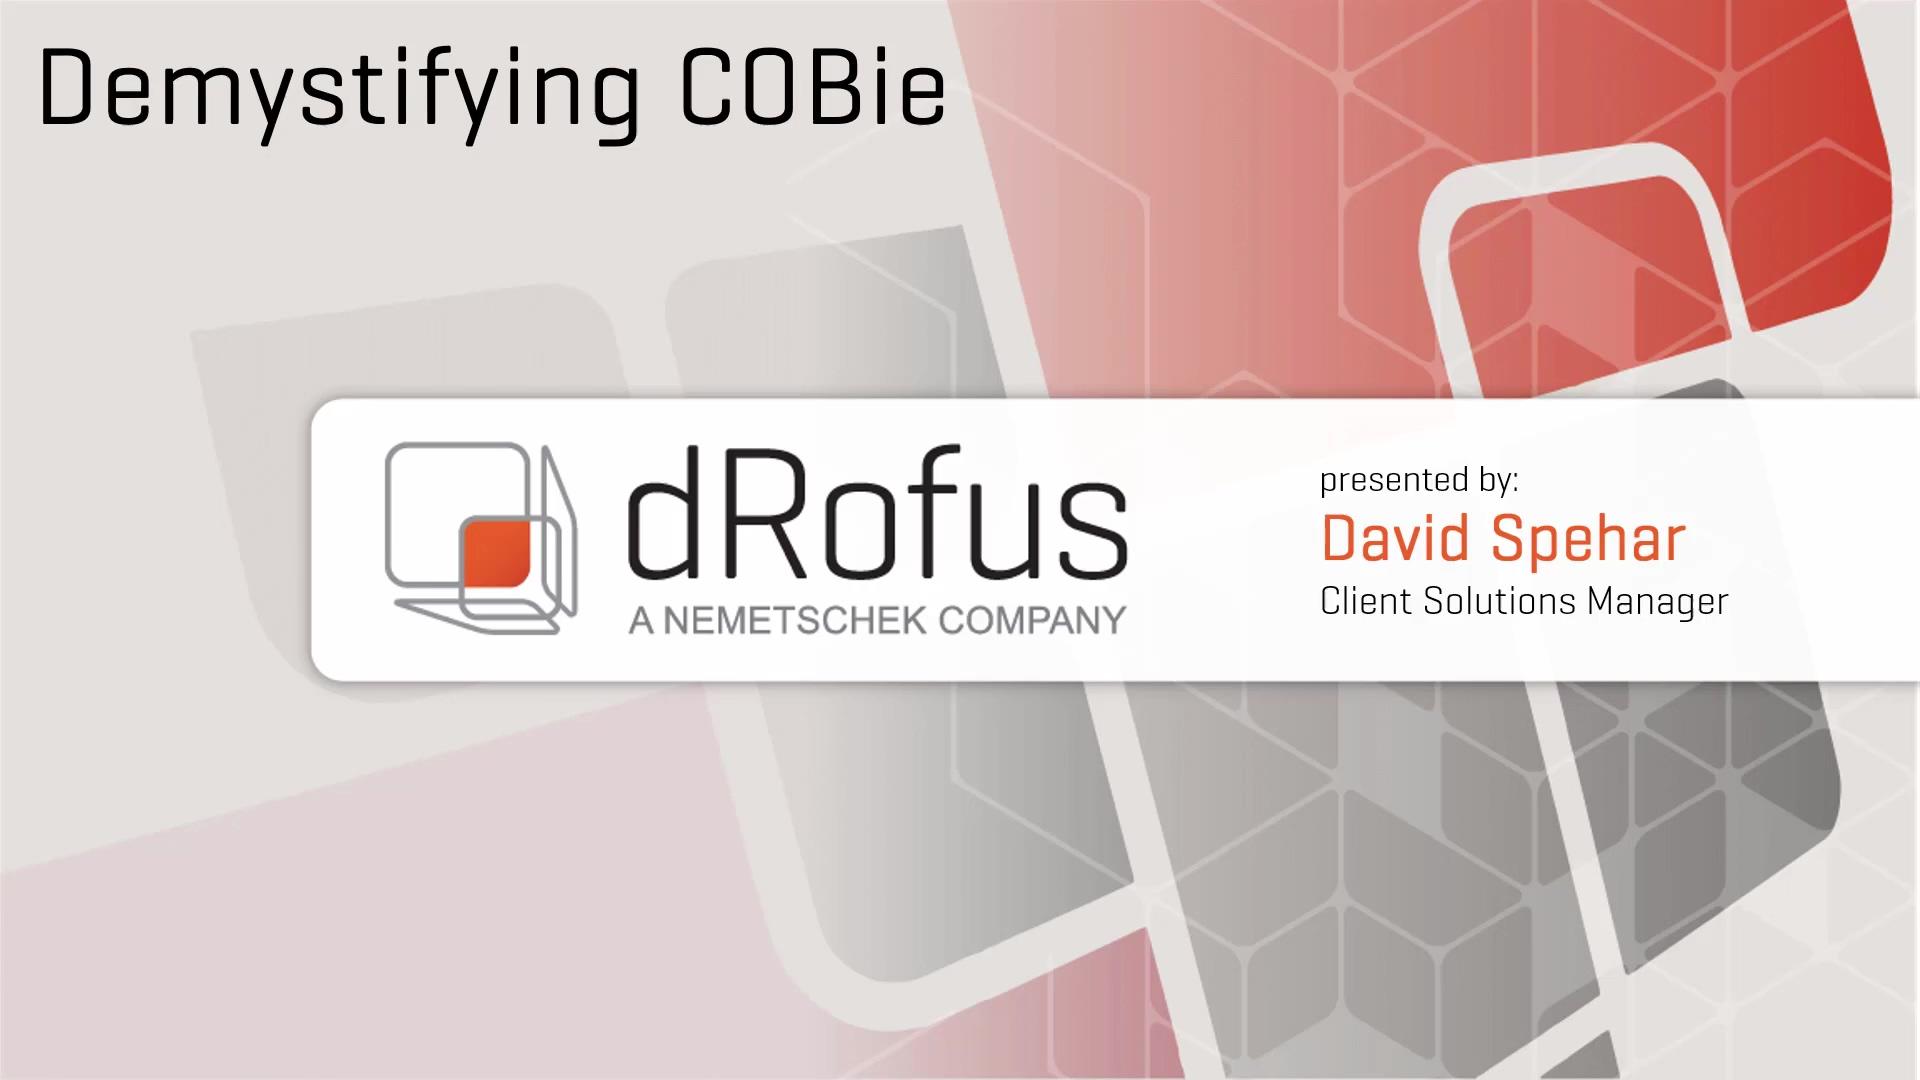 More stuffdRofus Demystifying COBie Webinar